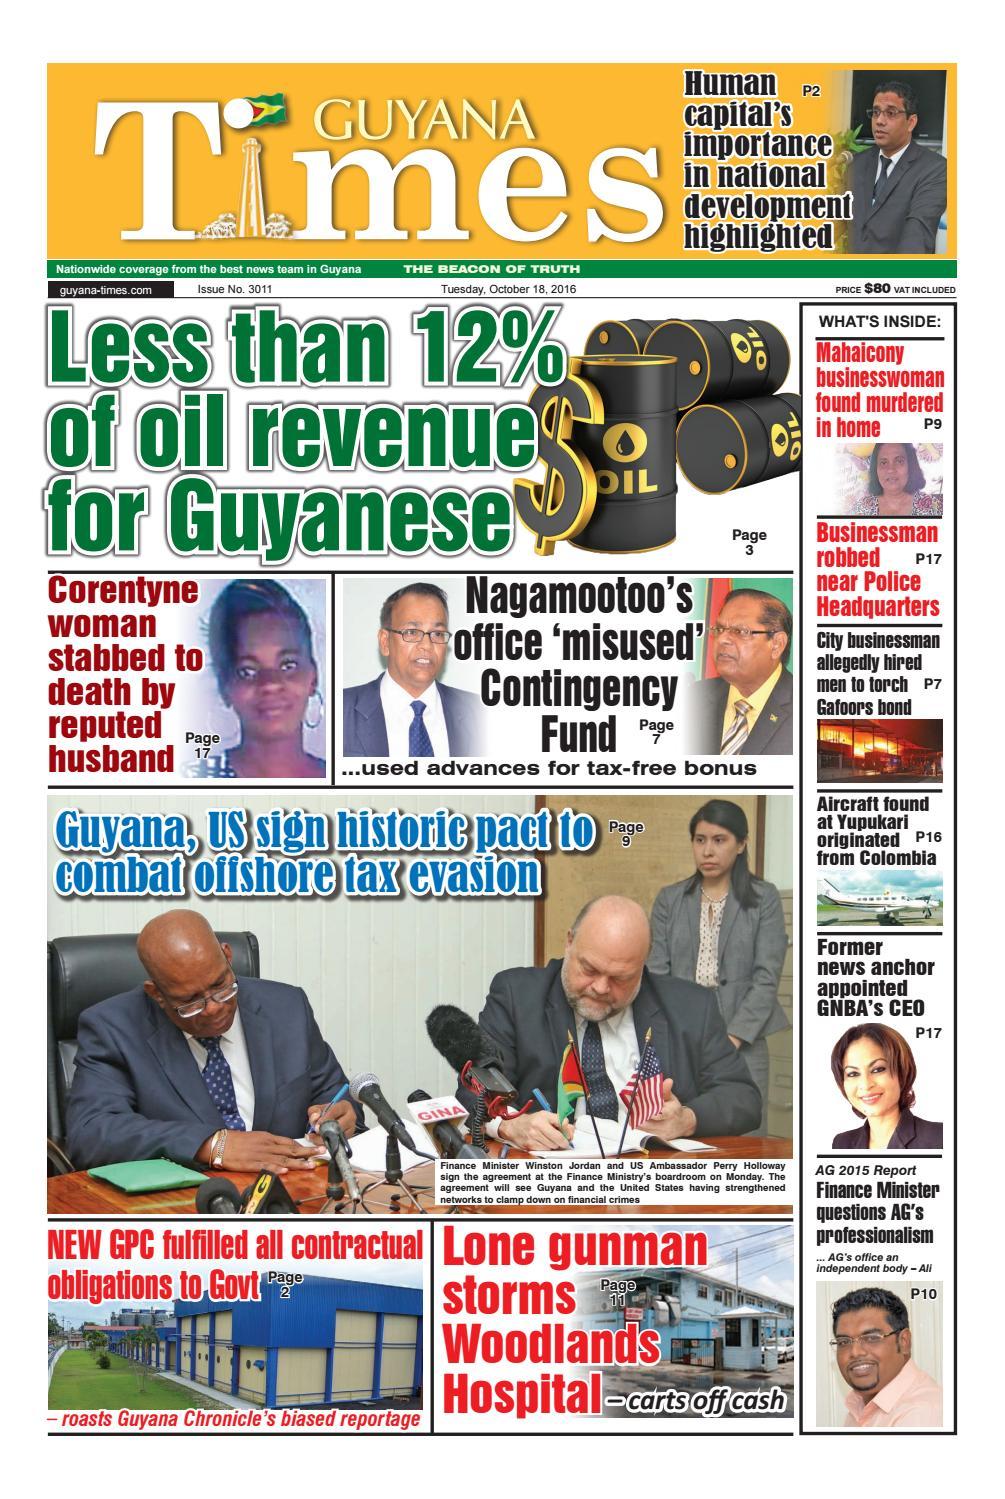 Guyana Times Daily by Gytimes - issuu